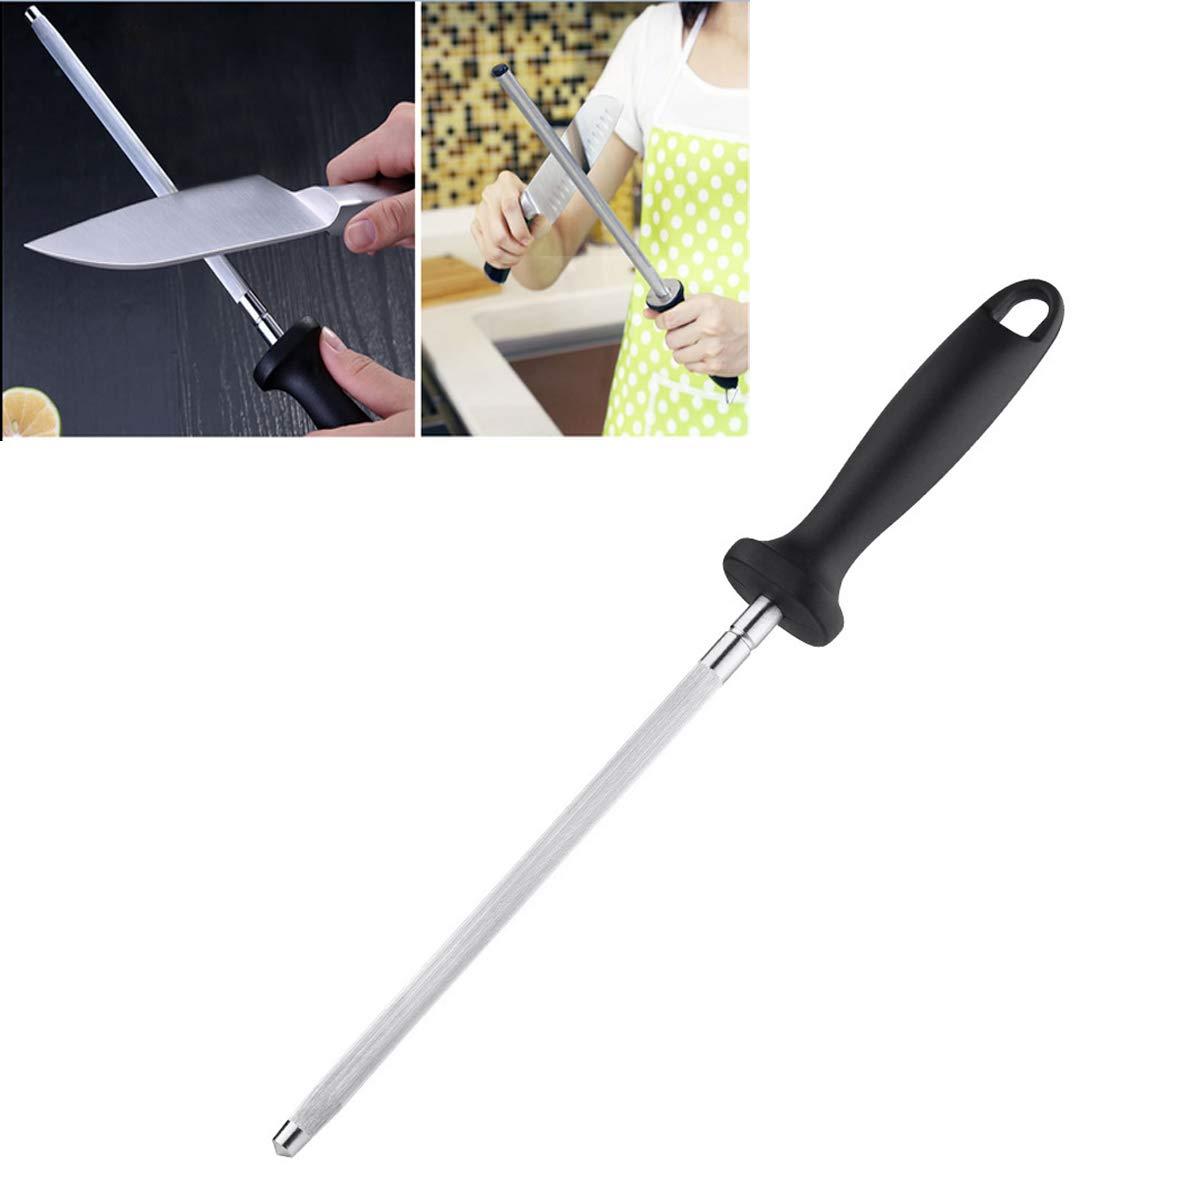 ACORRA 12 inch Diamond Sharpening Rod Lightweight Long Sharpening Sticks Household Honing Rod for Butcher Kitchen